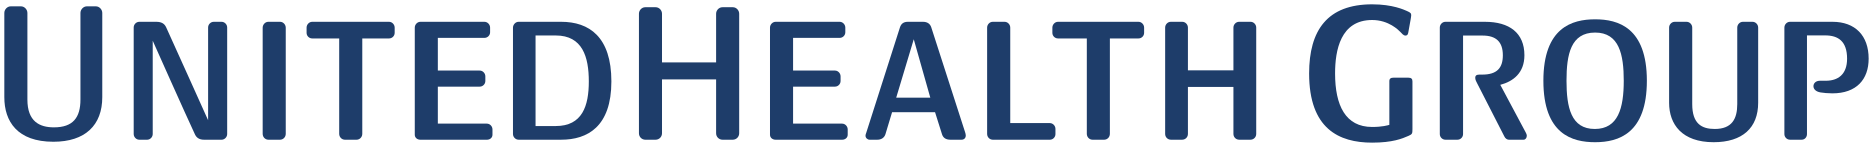 Unitedhealth Group Logo 1874x147